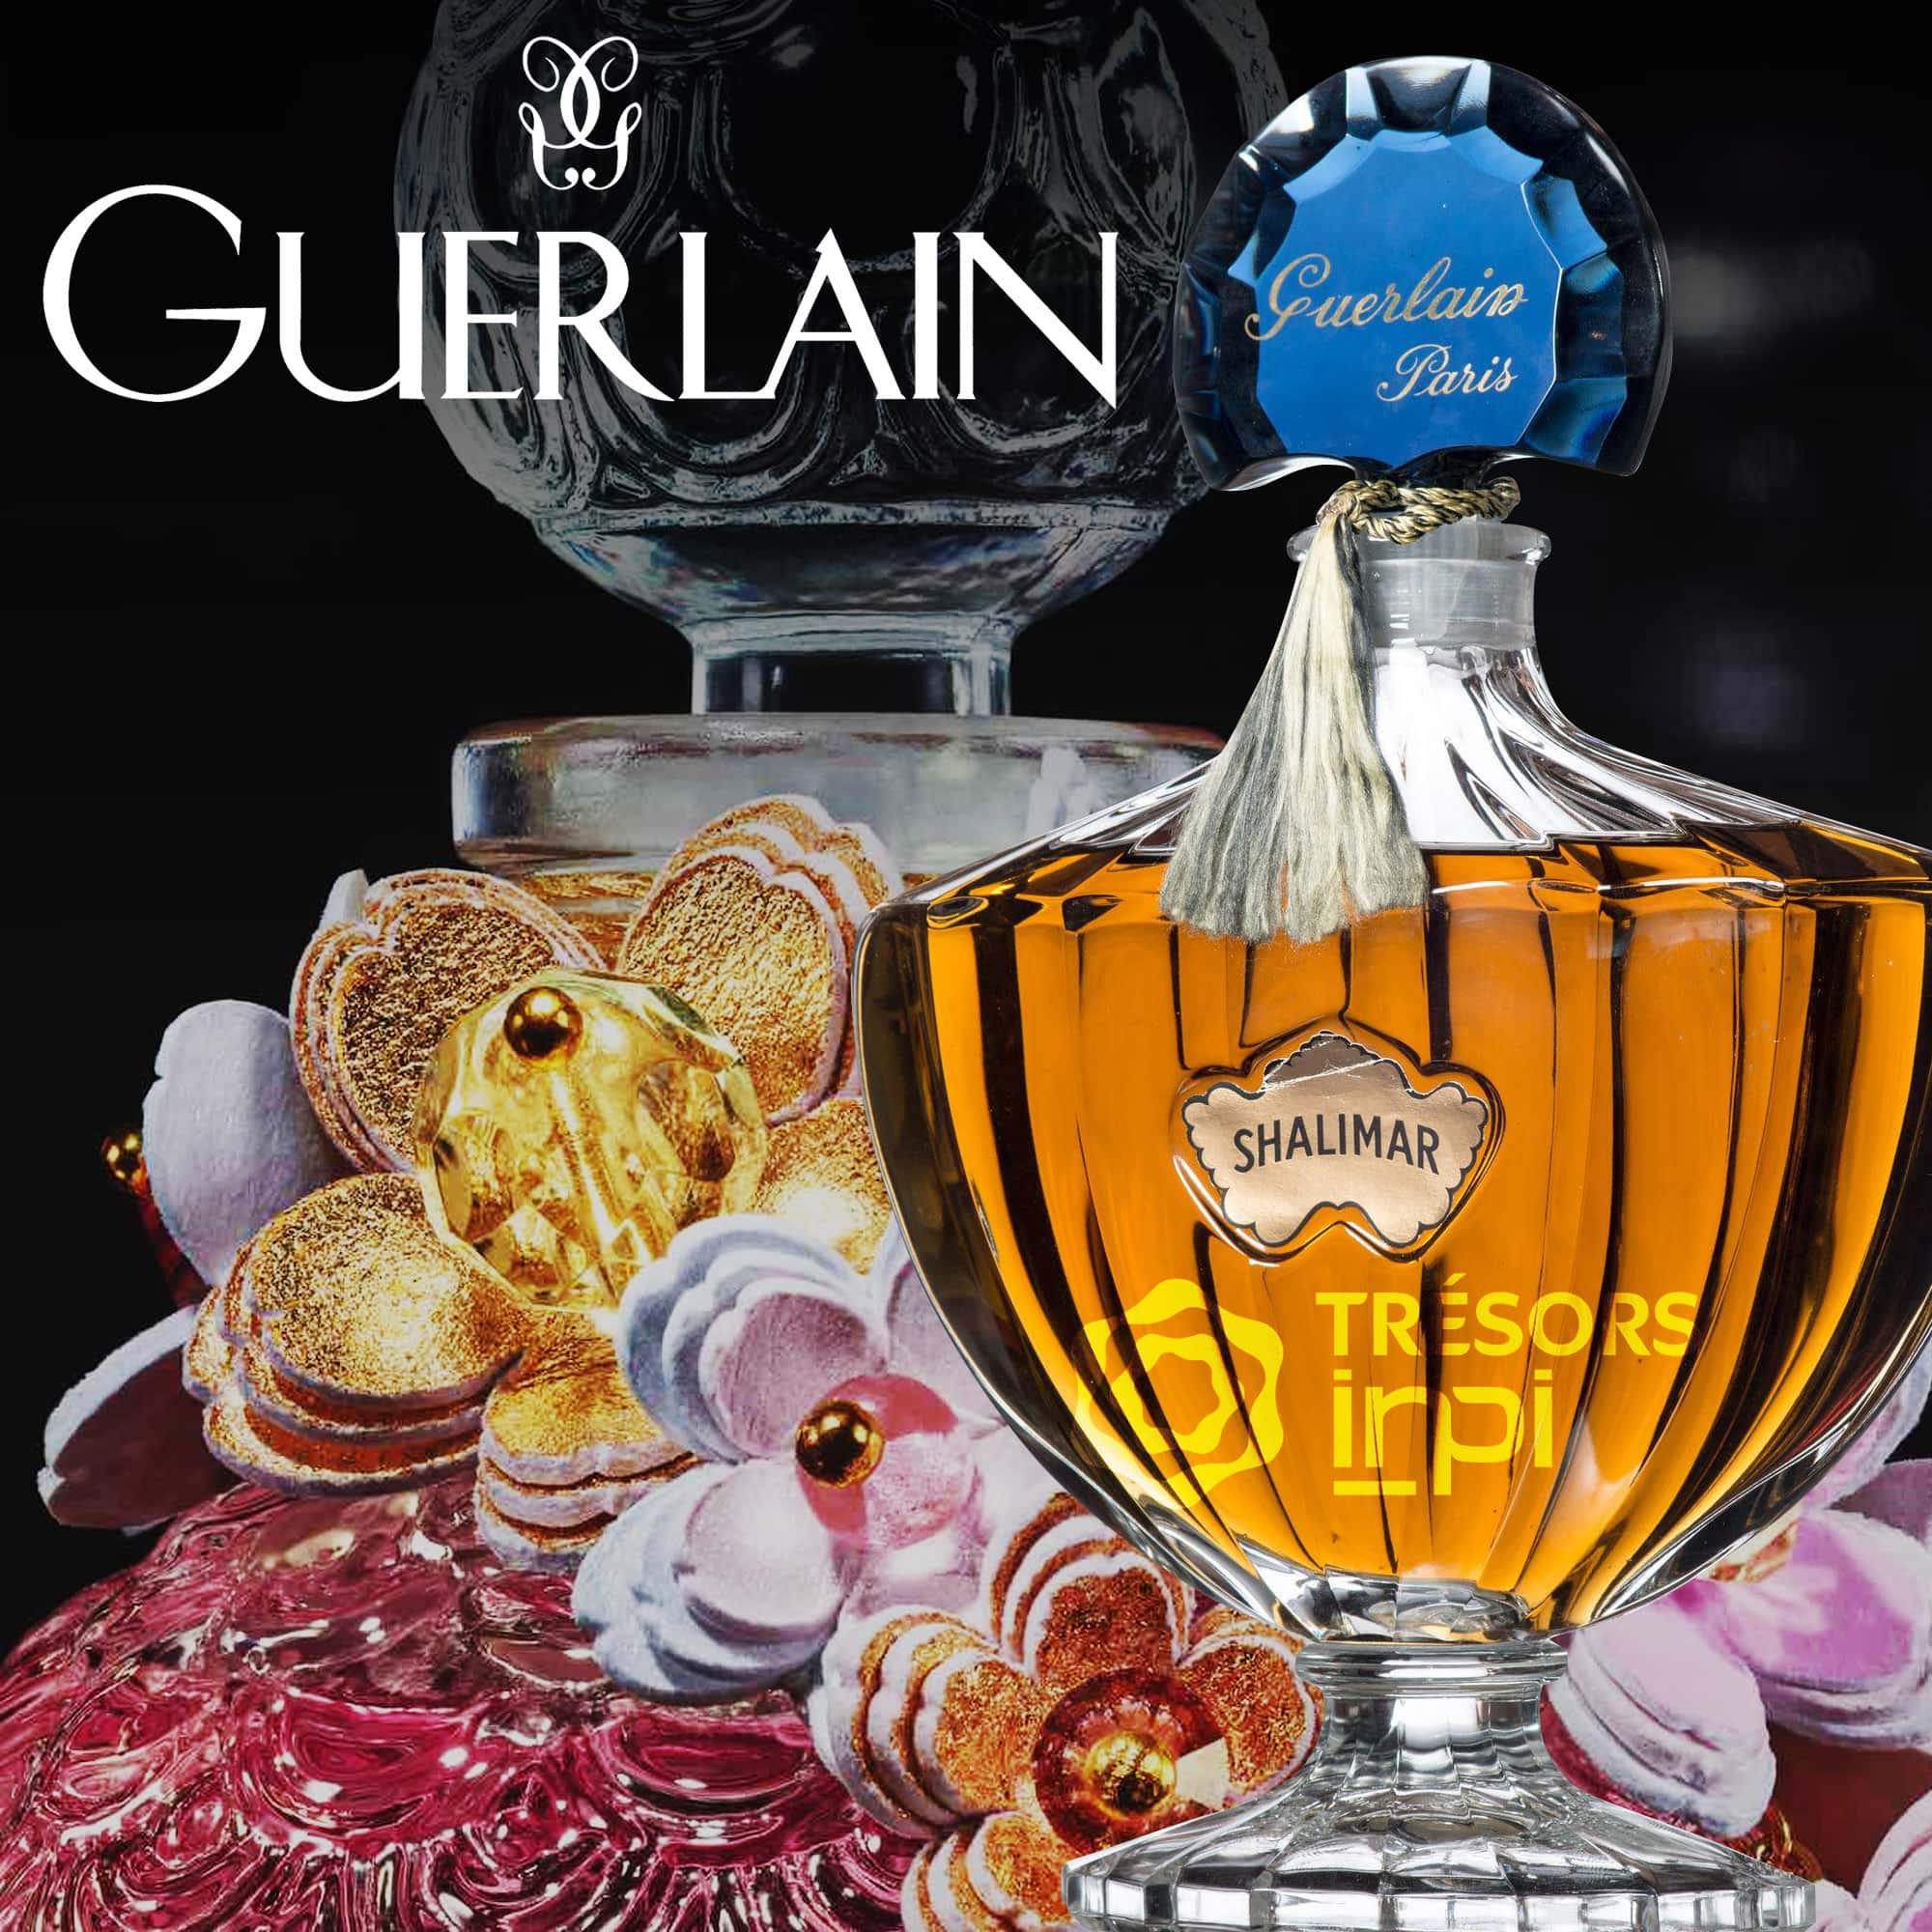 Perfume Guerlain - Tresors INPI by RUNWAY MAGAZINE